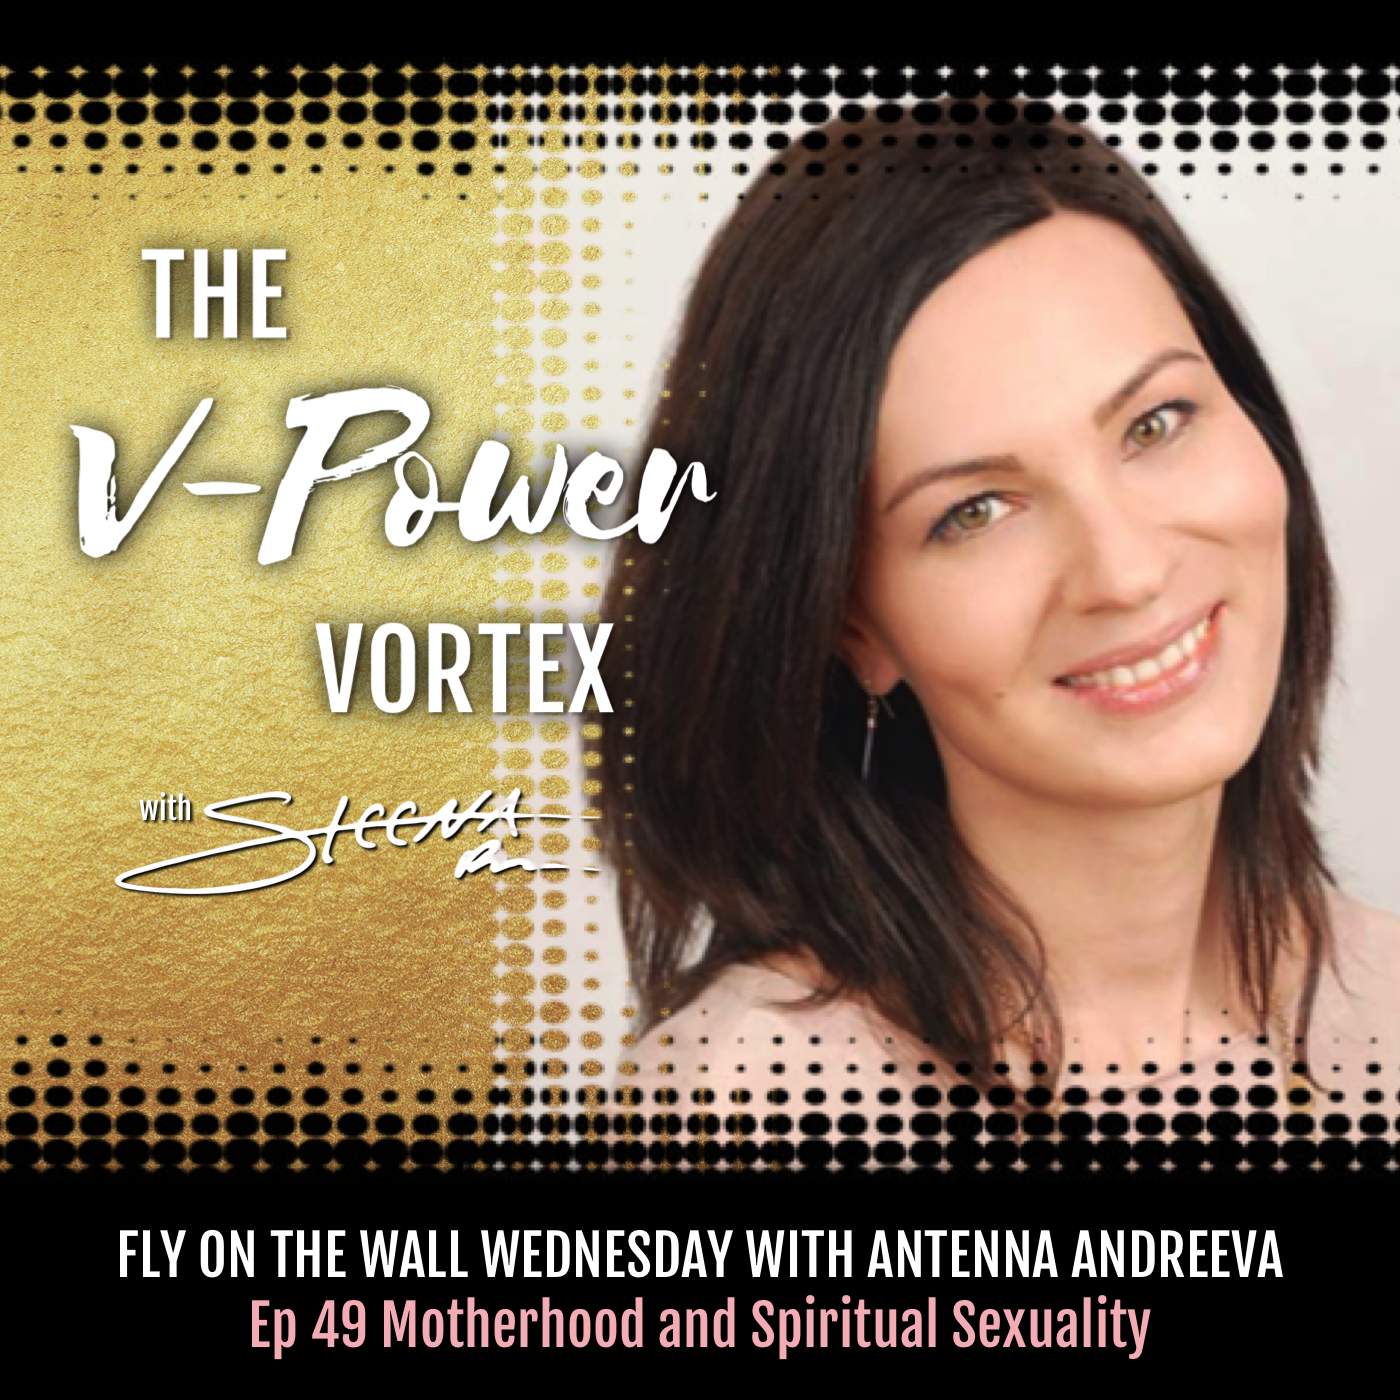 Ep 49 Motherhood and Spiritual Sexuality - Fly on the Wall Wednesday with Antonina Andreeva.jpeg